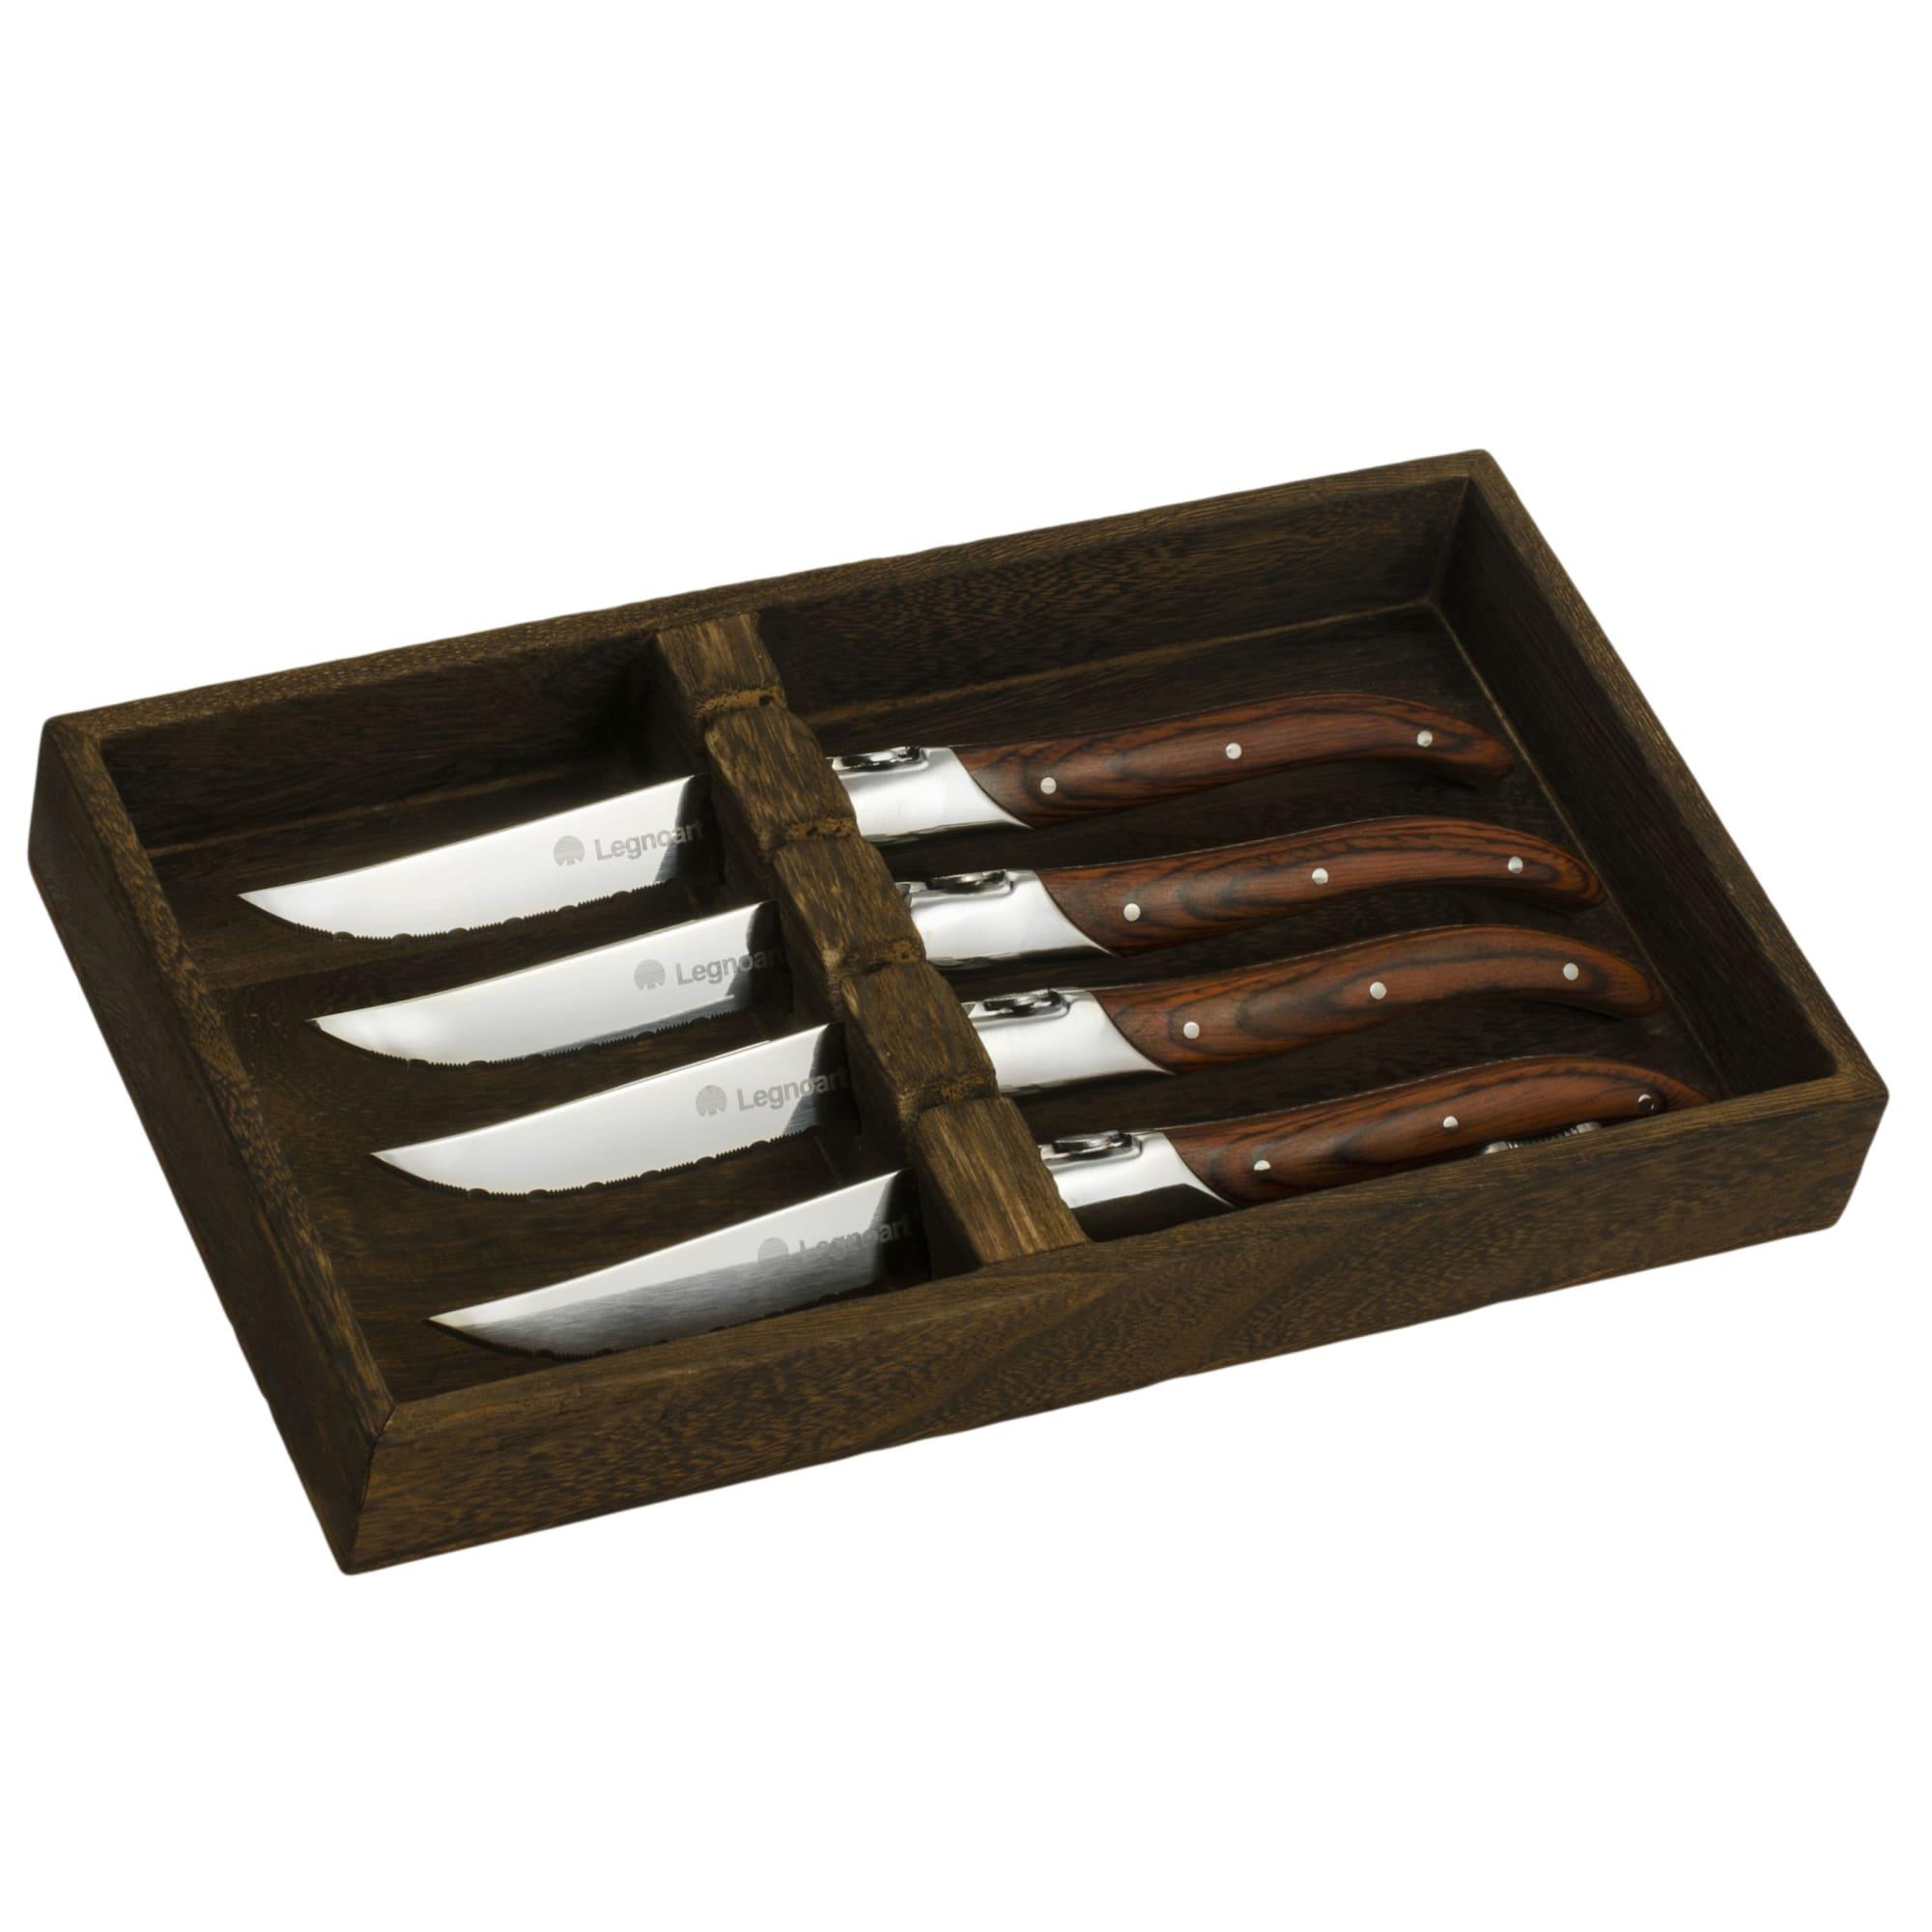 4 knive i trækasse